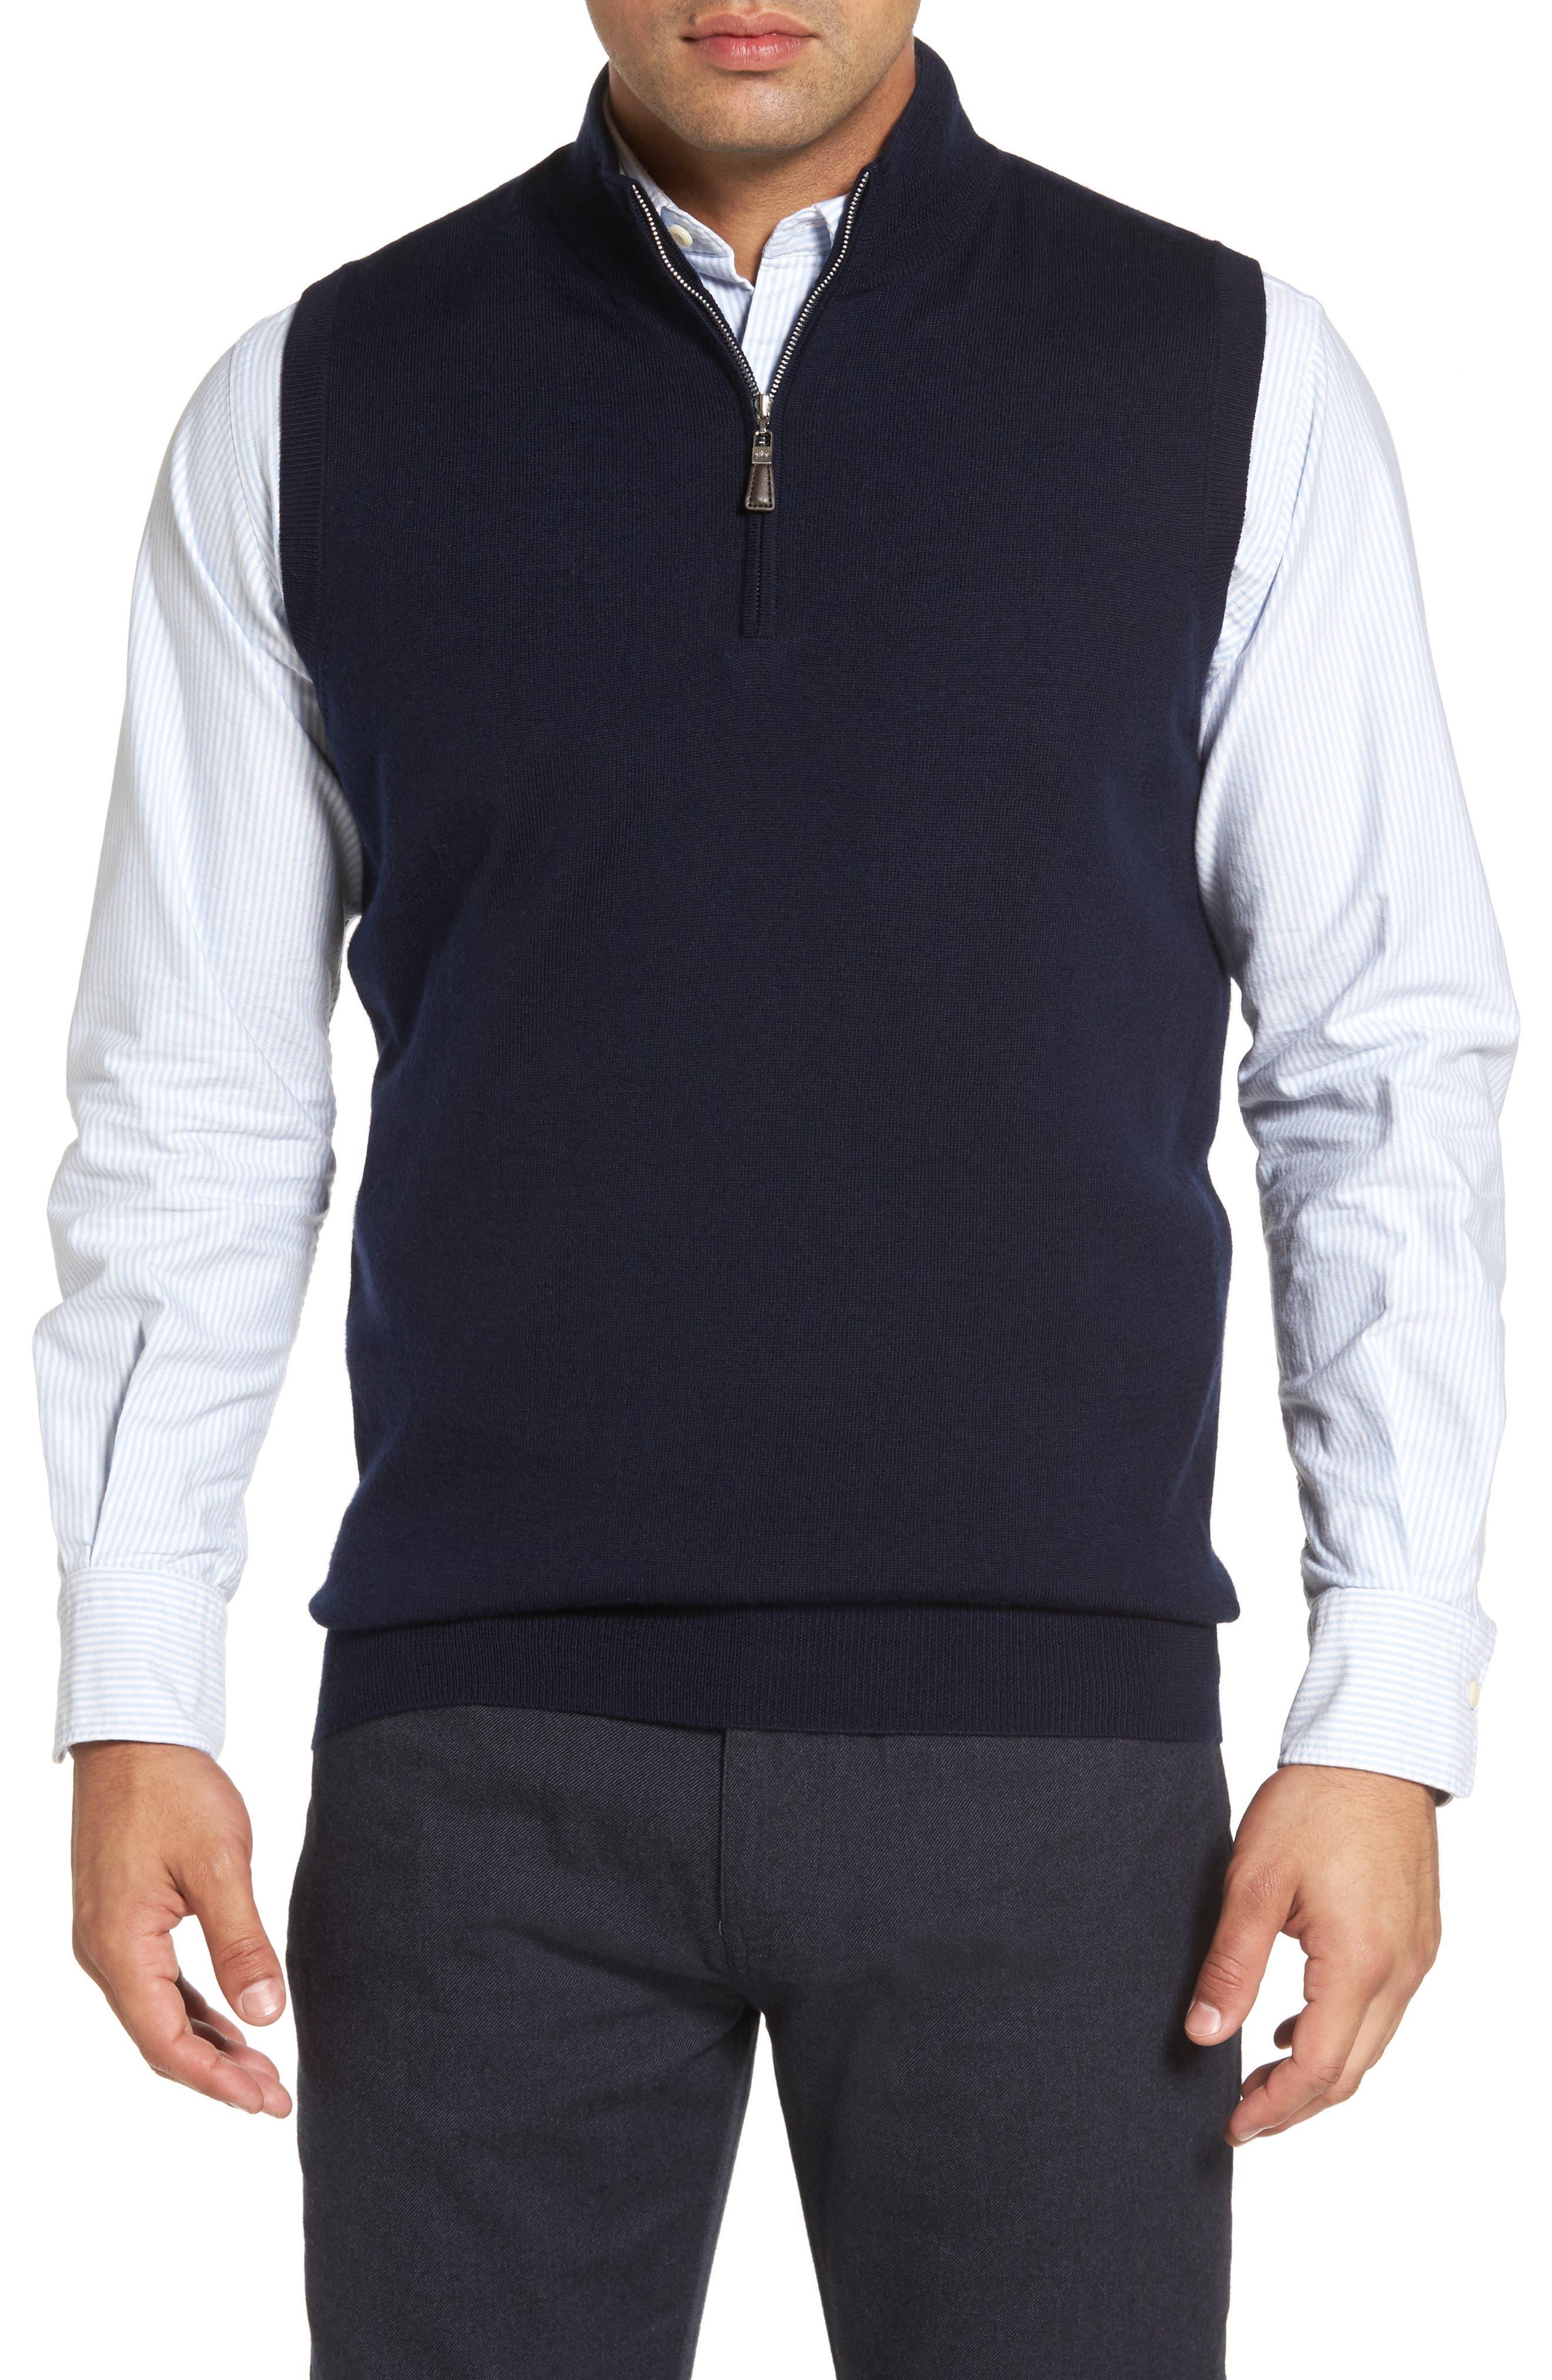 Alternate Image 1 Selected - Peter Millar Crown Soft Merino Blend Quarter Zip Vest